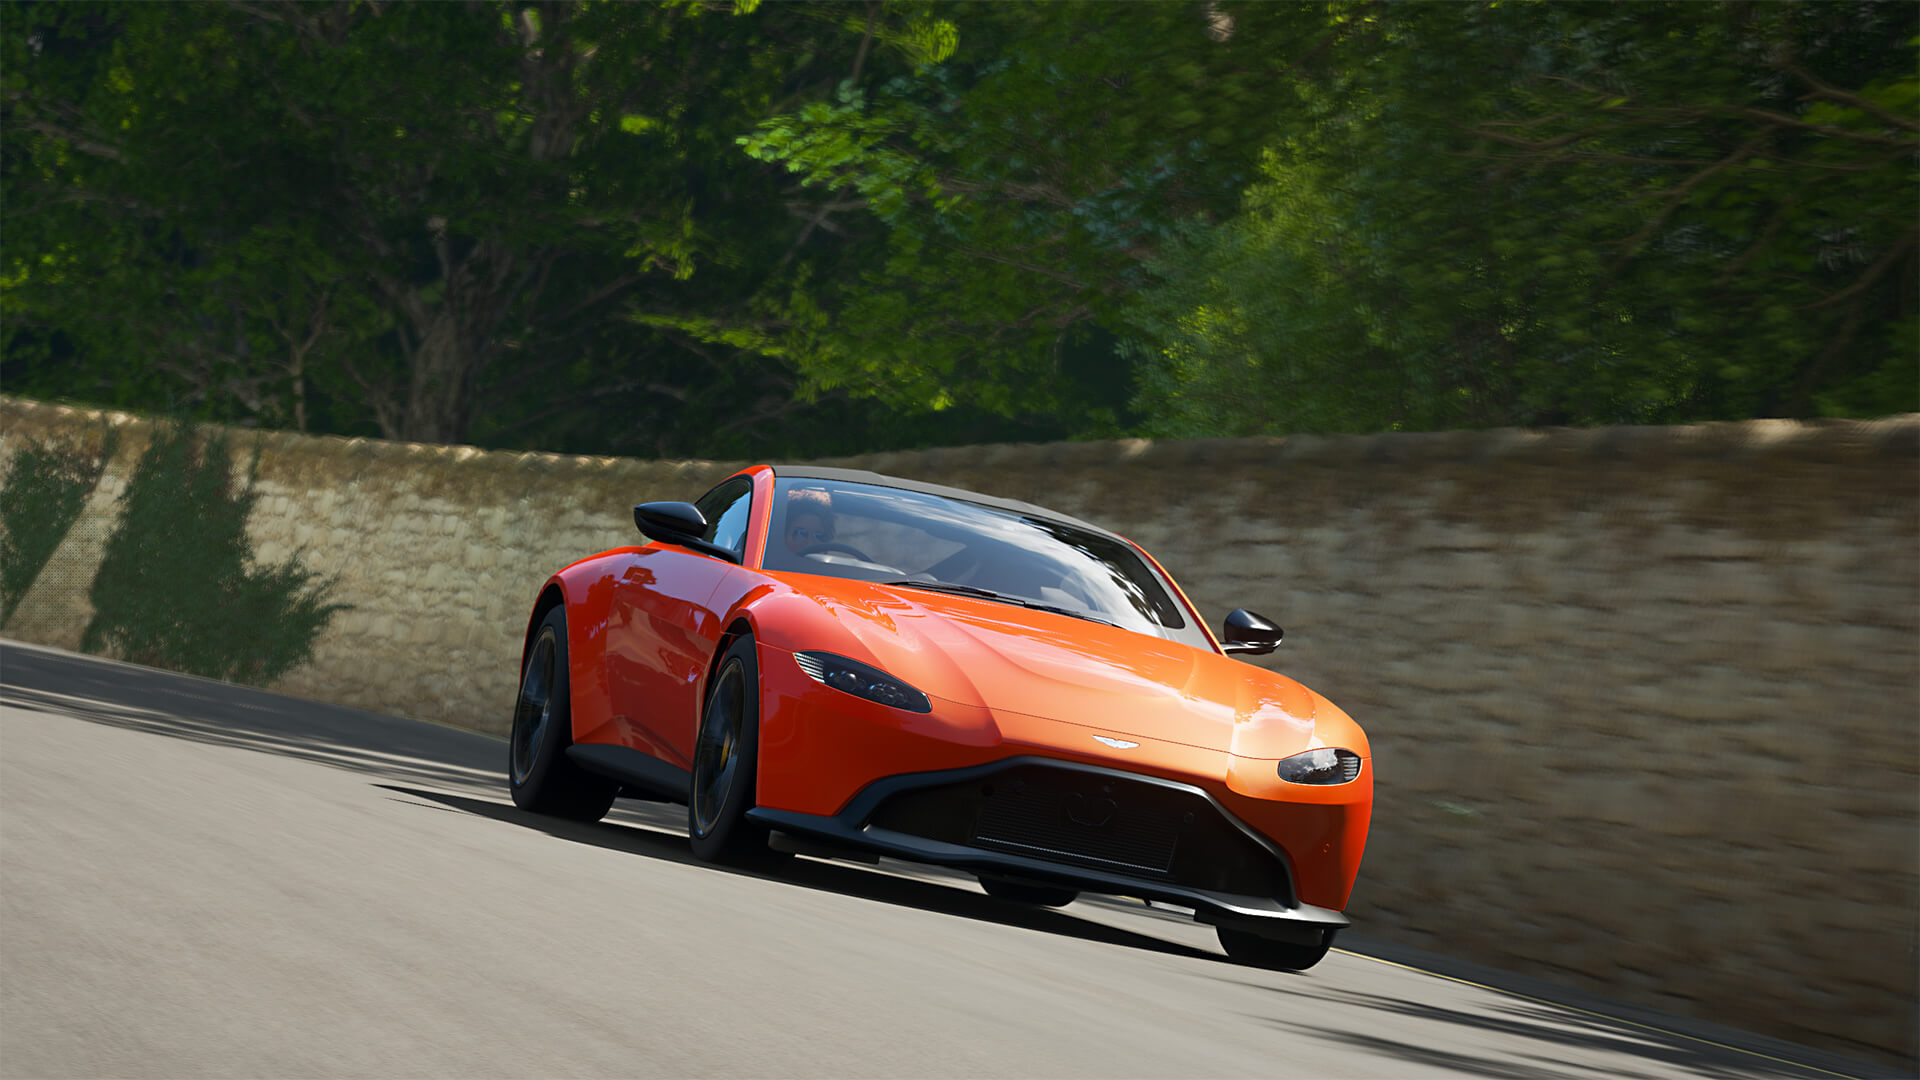 Forza Horizon 4 Gains The Brand New Aston Martin Vantage And A Convertible Mclaren This Week